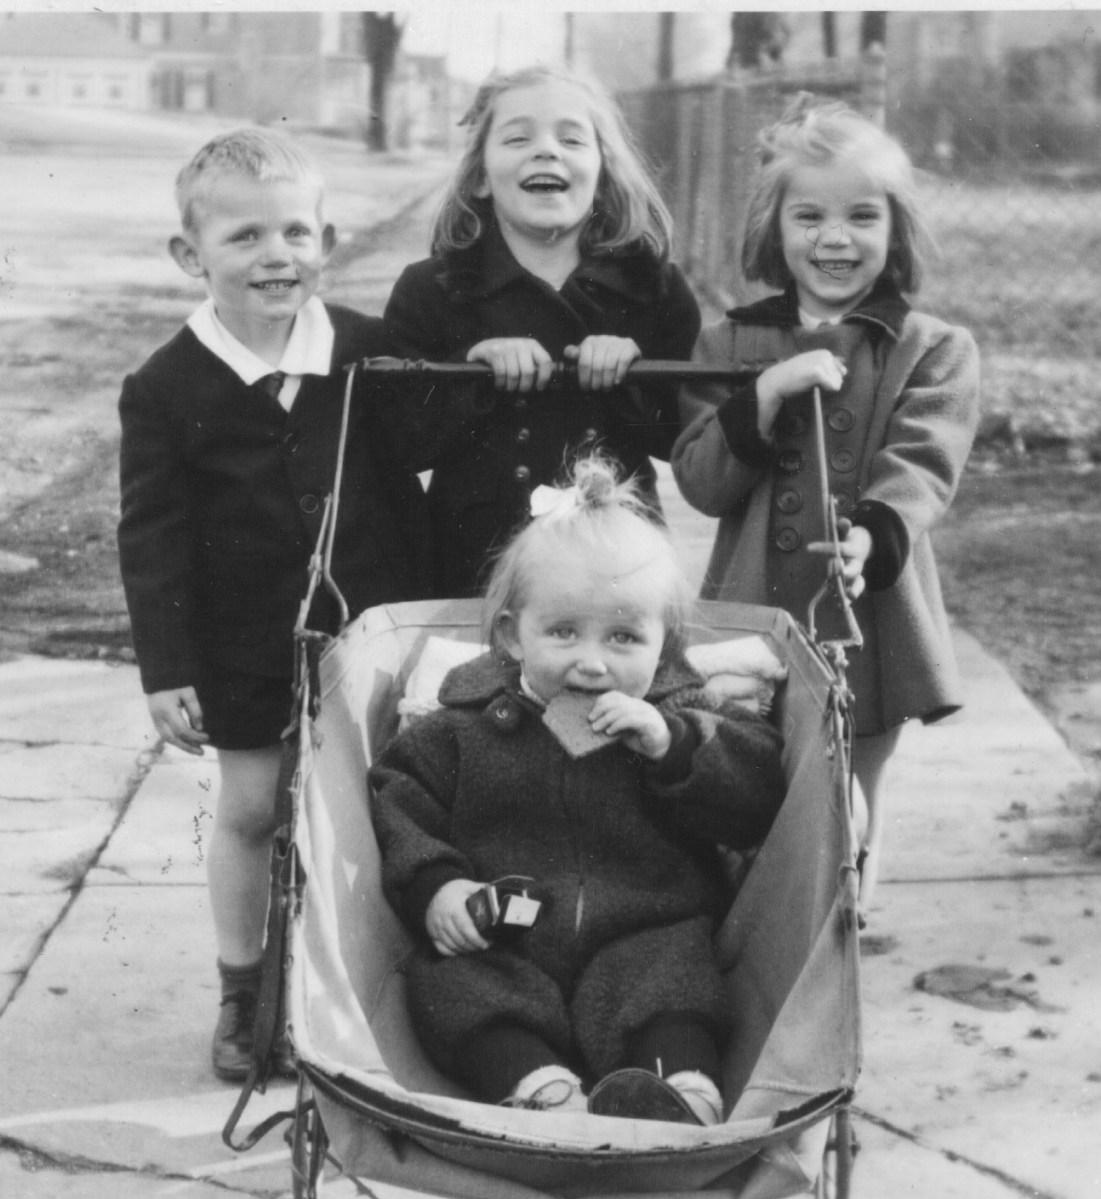 the West kids - George, Sally, Martha, and Nancy